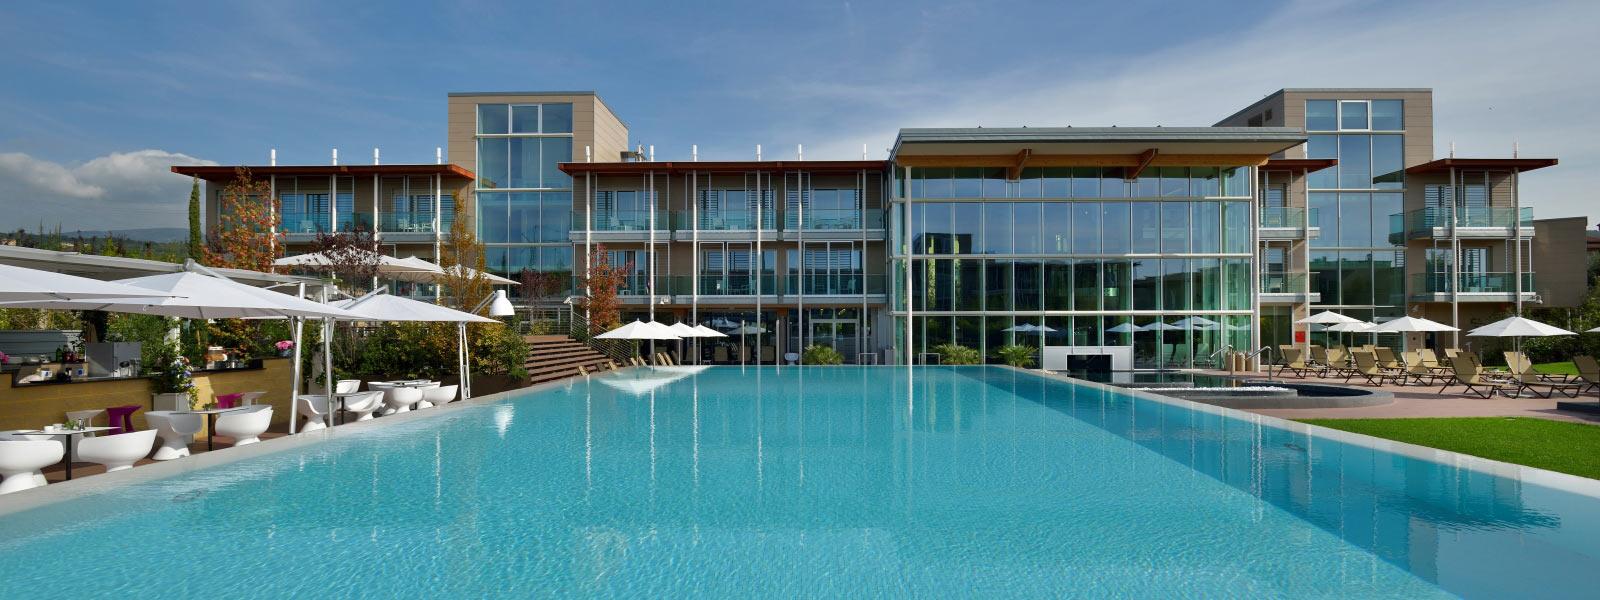 Aqualux hotel spa suite terme bardolino verona lago - Alberghi saturnia con piscina termale ...